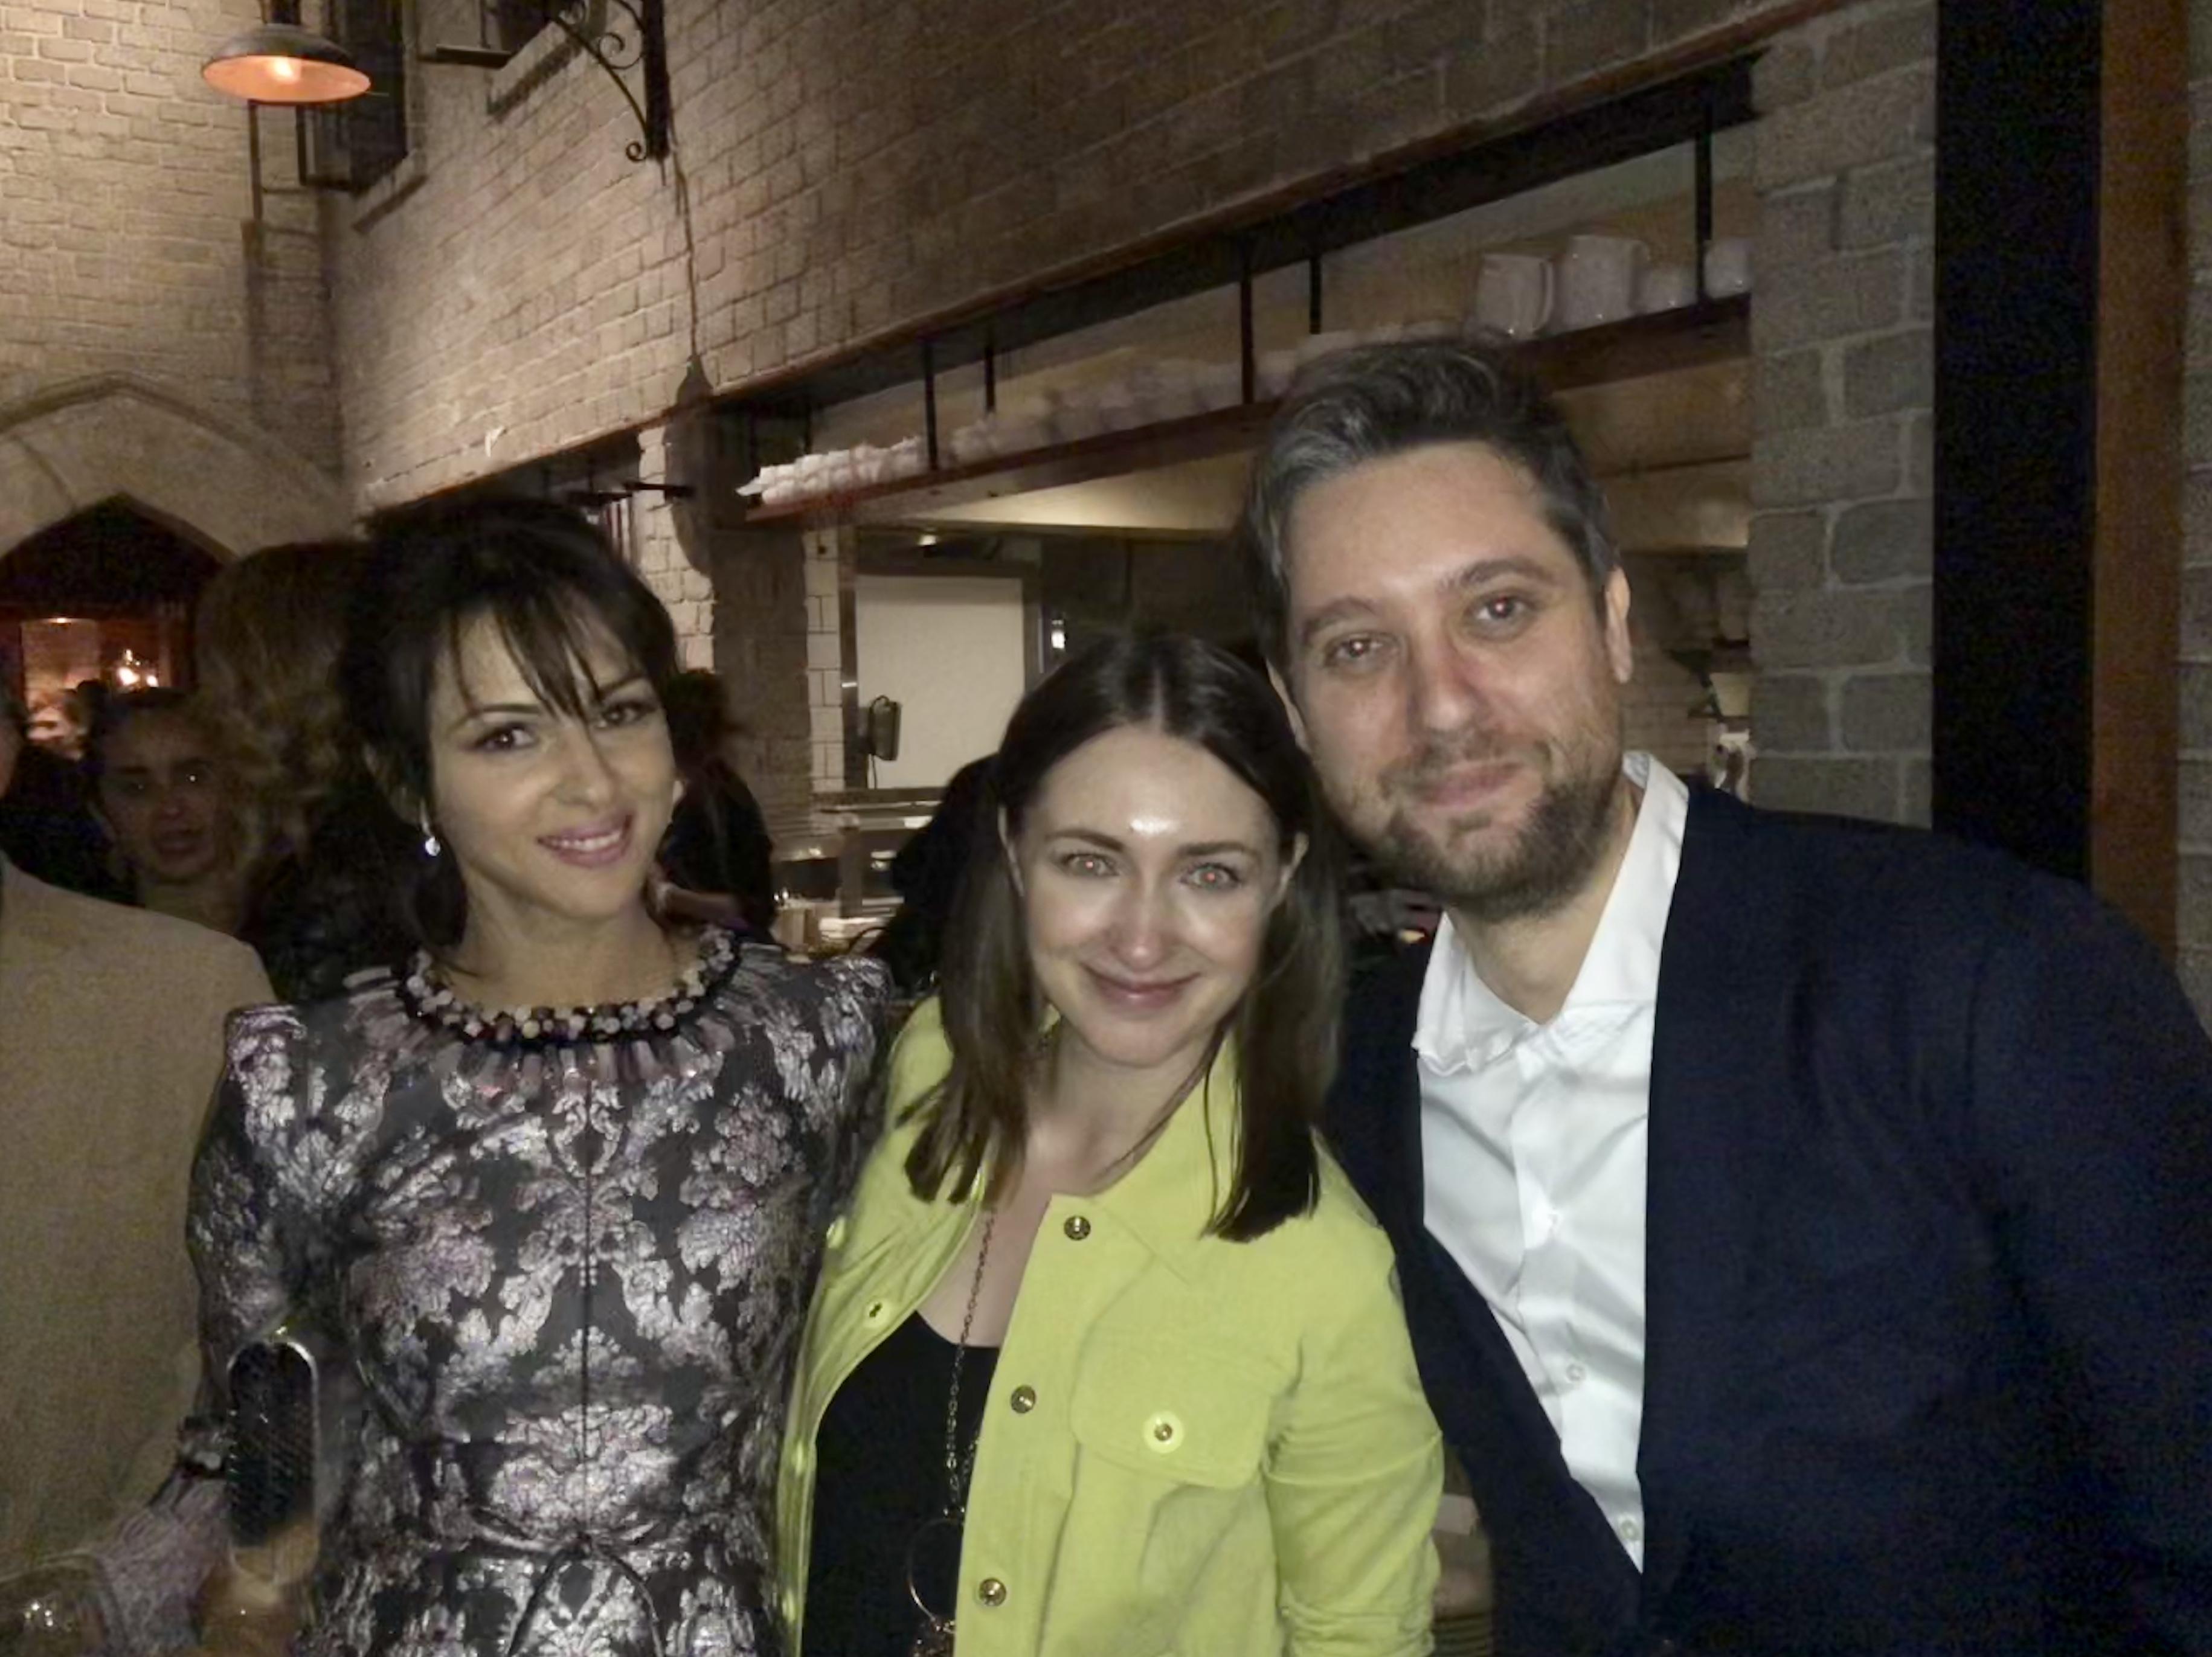 Sonya Belousova & Giona Ostinelli with The Romanoffs actress Annet Mahendru